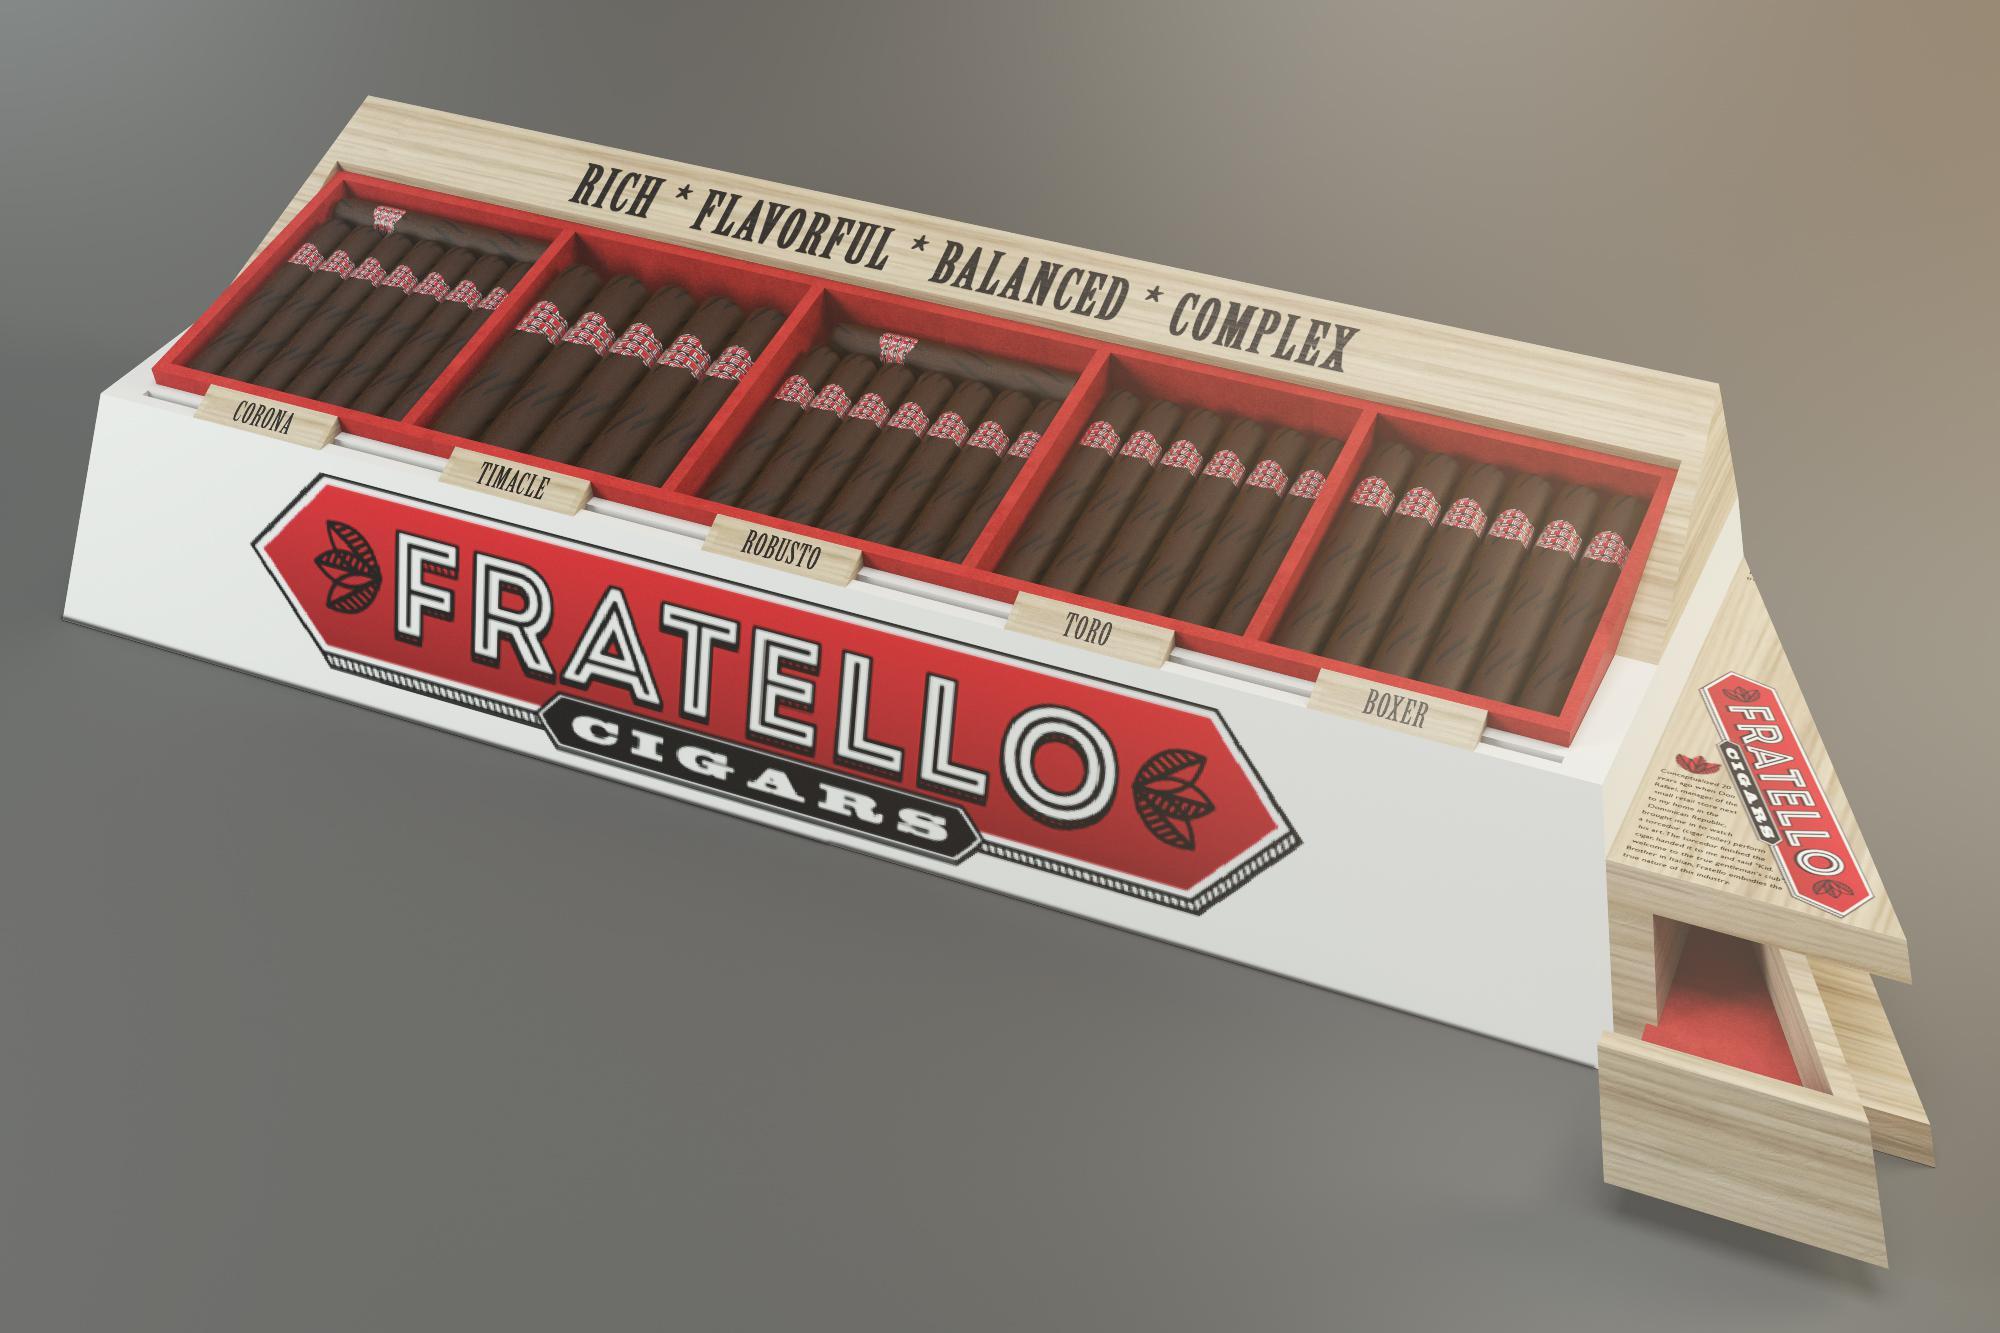 cigar news fratello introducing